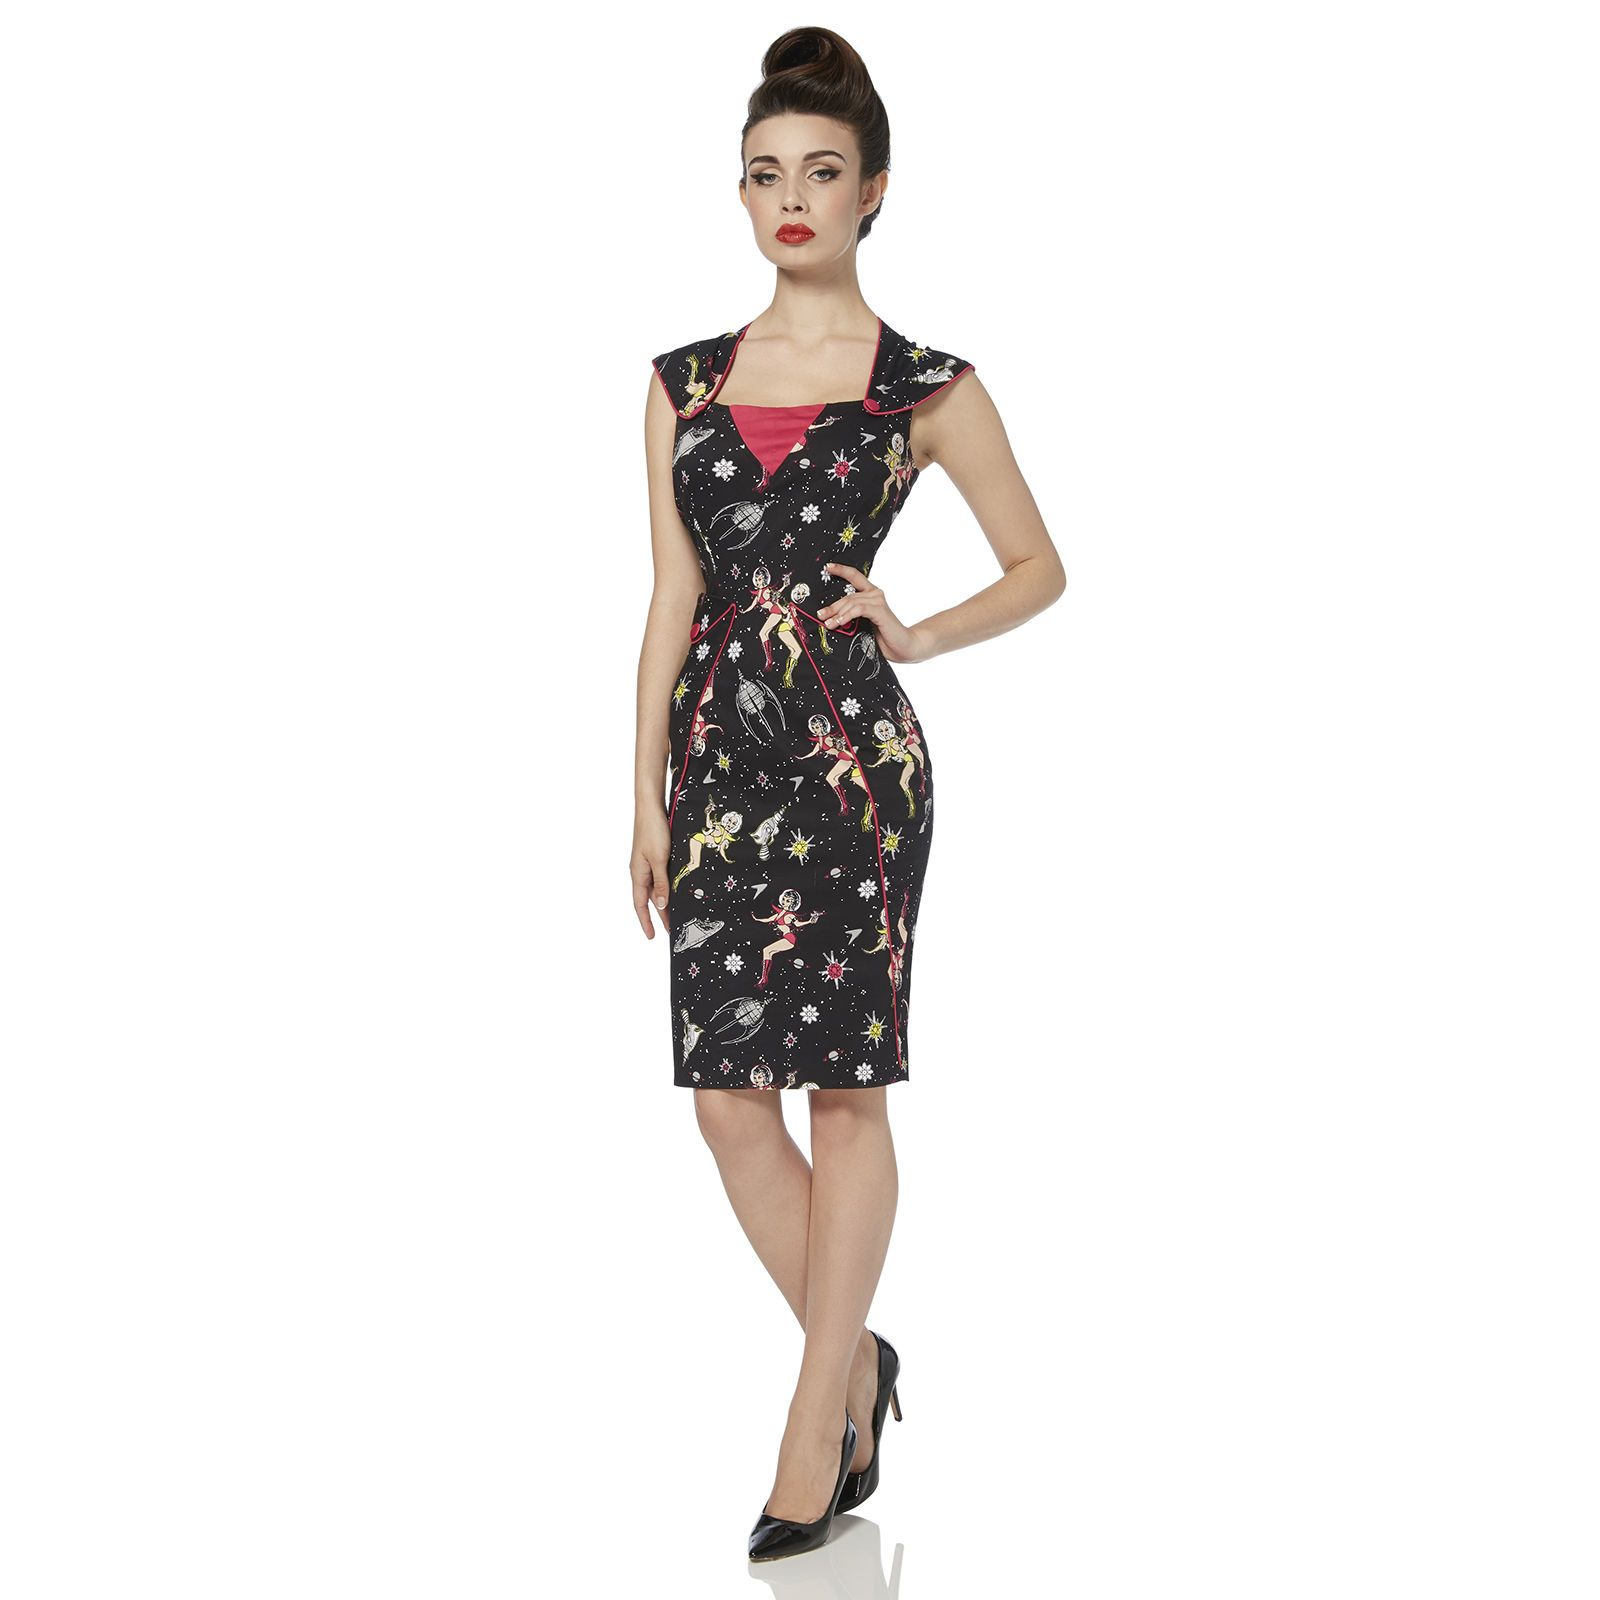 eca189b90a6125 Voodoo Vixen Zara Space Dress | Black Retro 1950s Space Pencil Dress ...